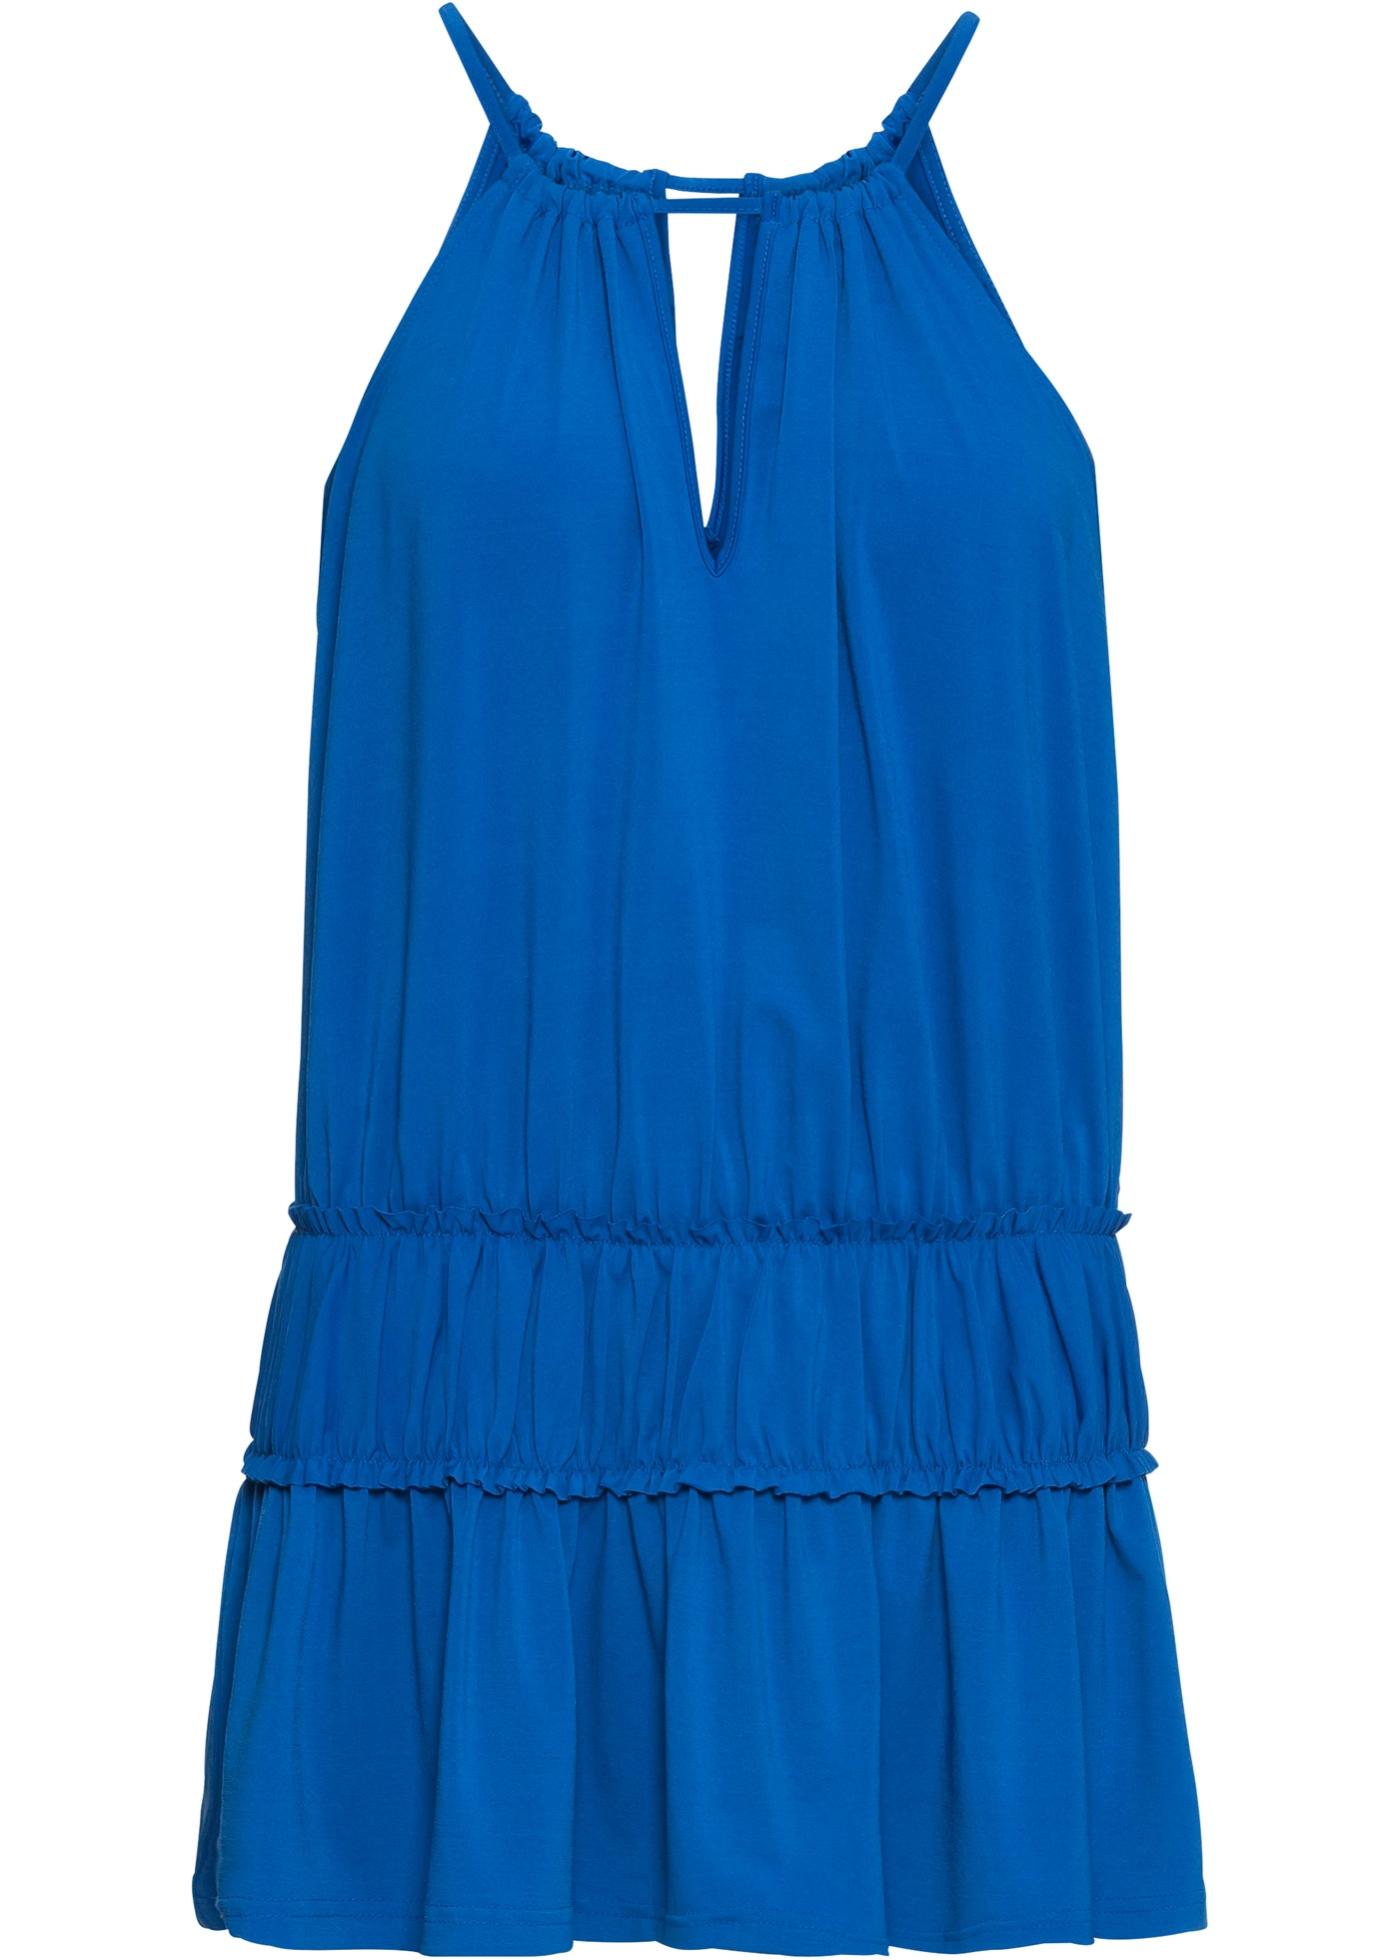 BonprixTop Sans Manches Femme Pour Bleu Bodyflirt UzqSpGVM